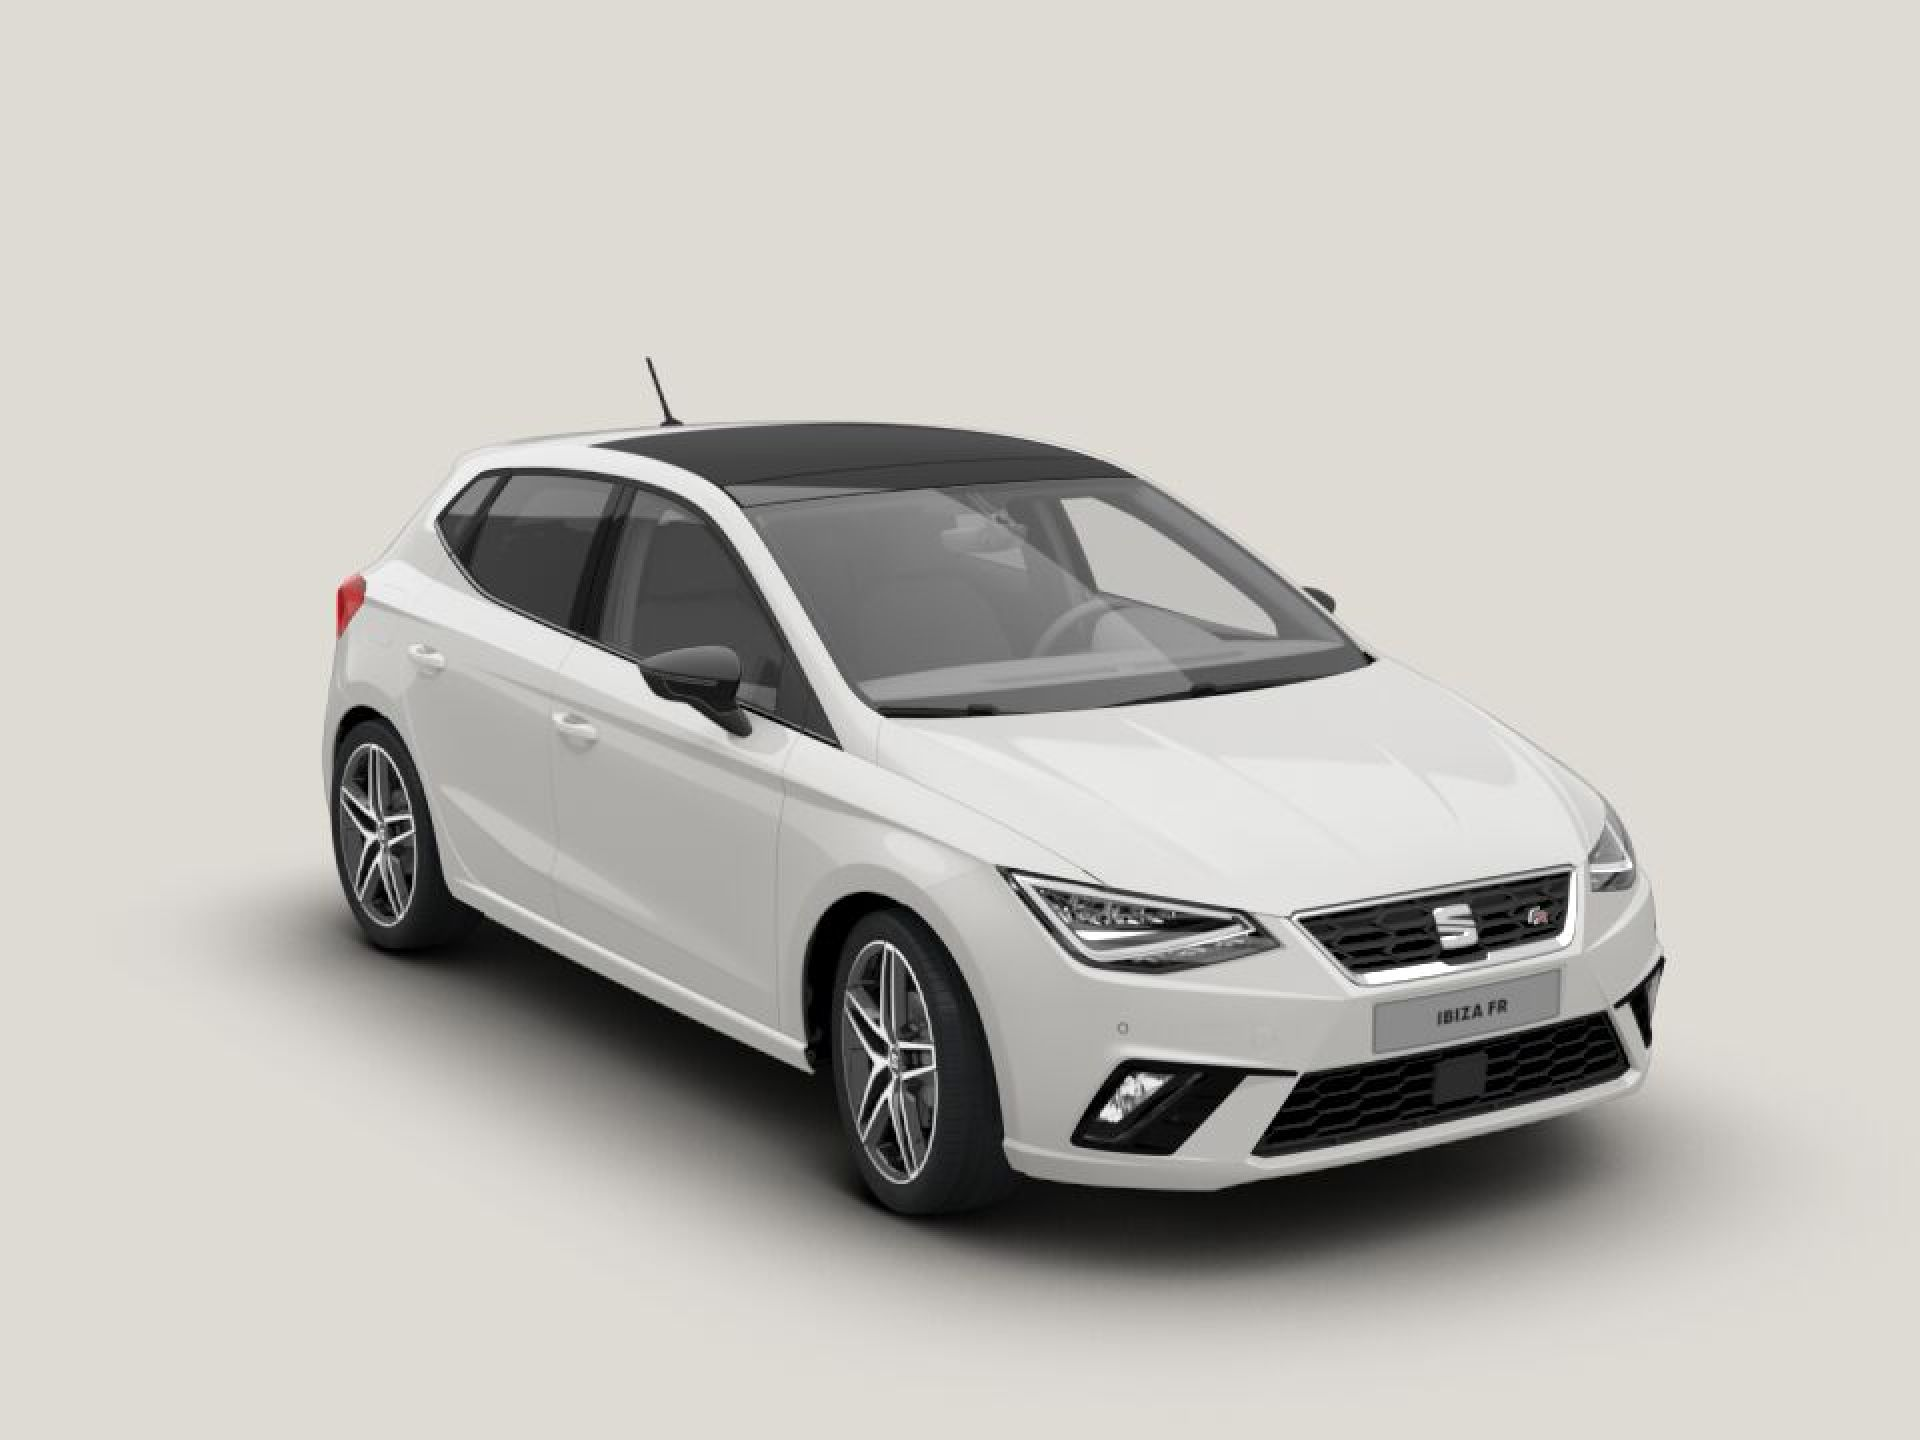 SEAT Ibiza 1.5 TSI 110kW (150CV) DSG FR Go nuevo Madrid